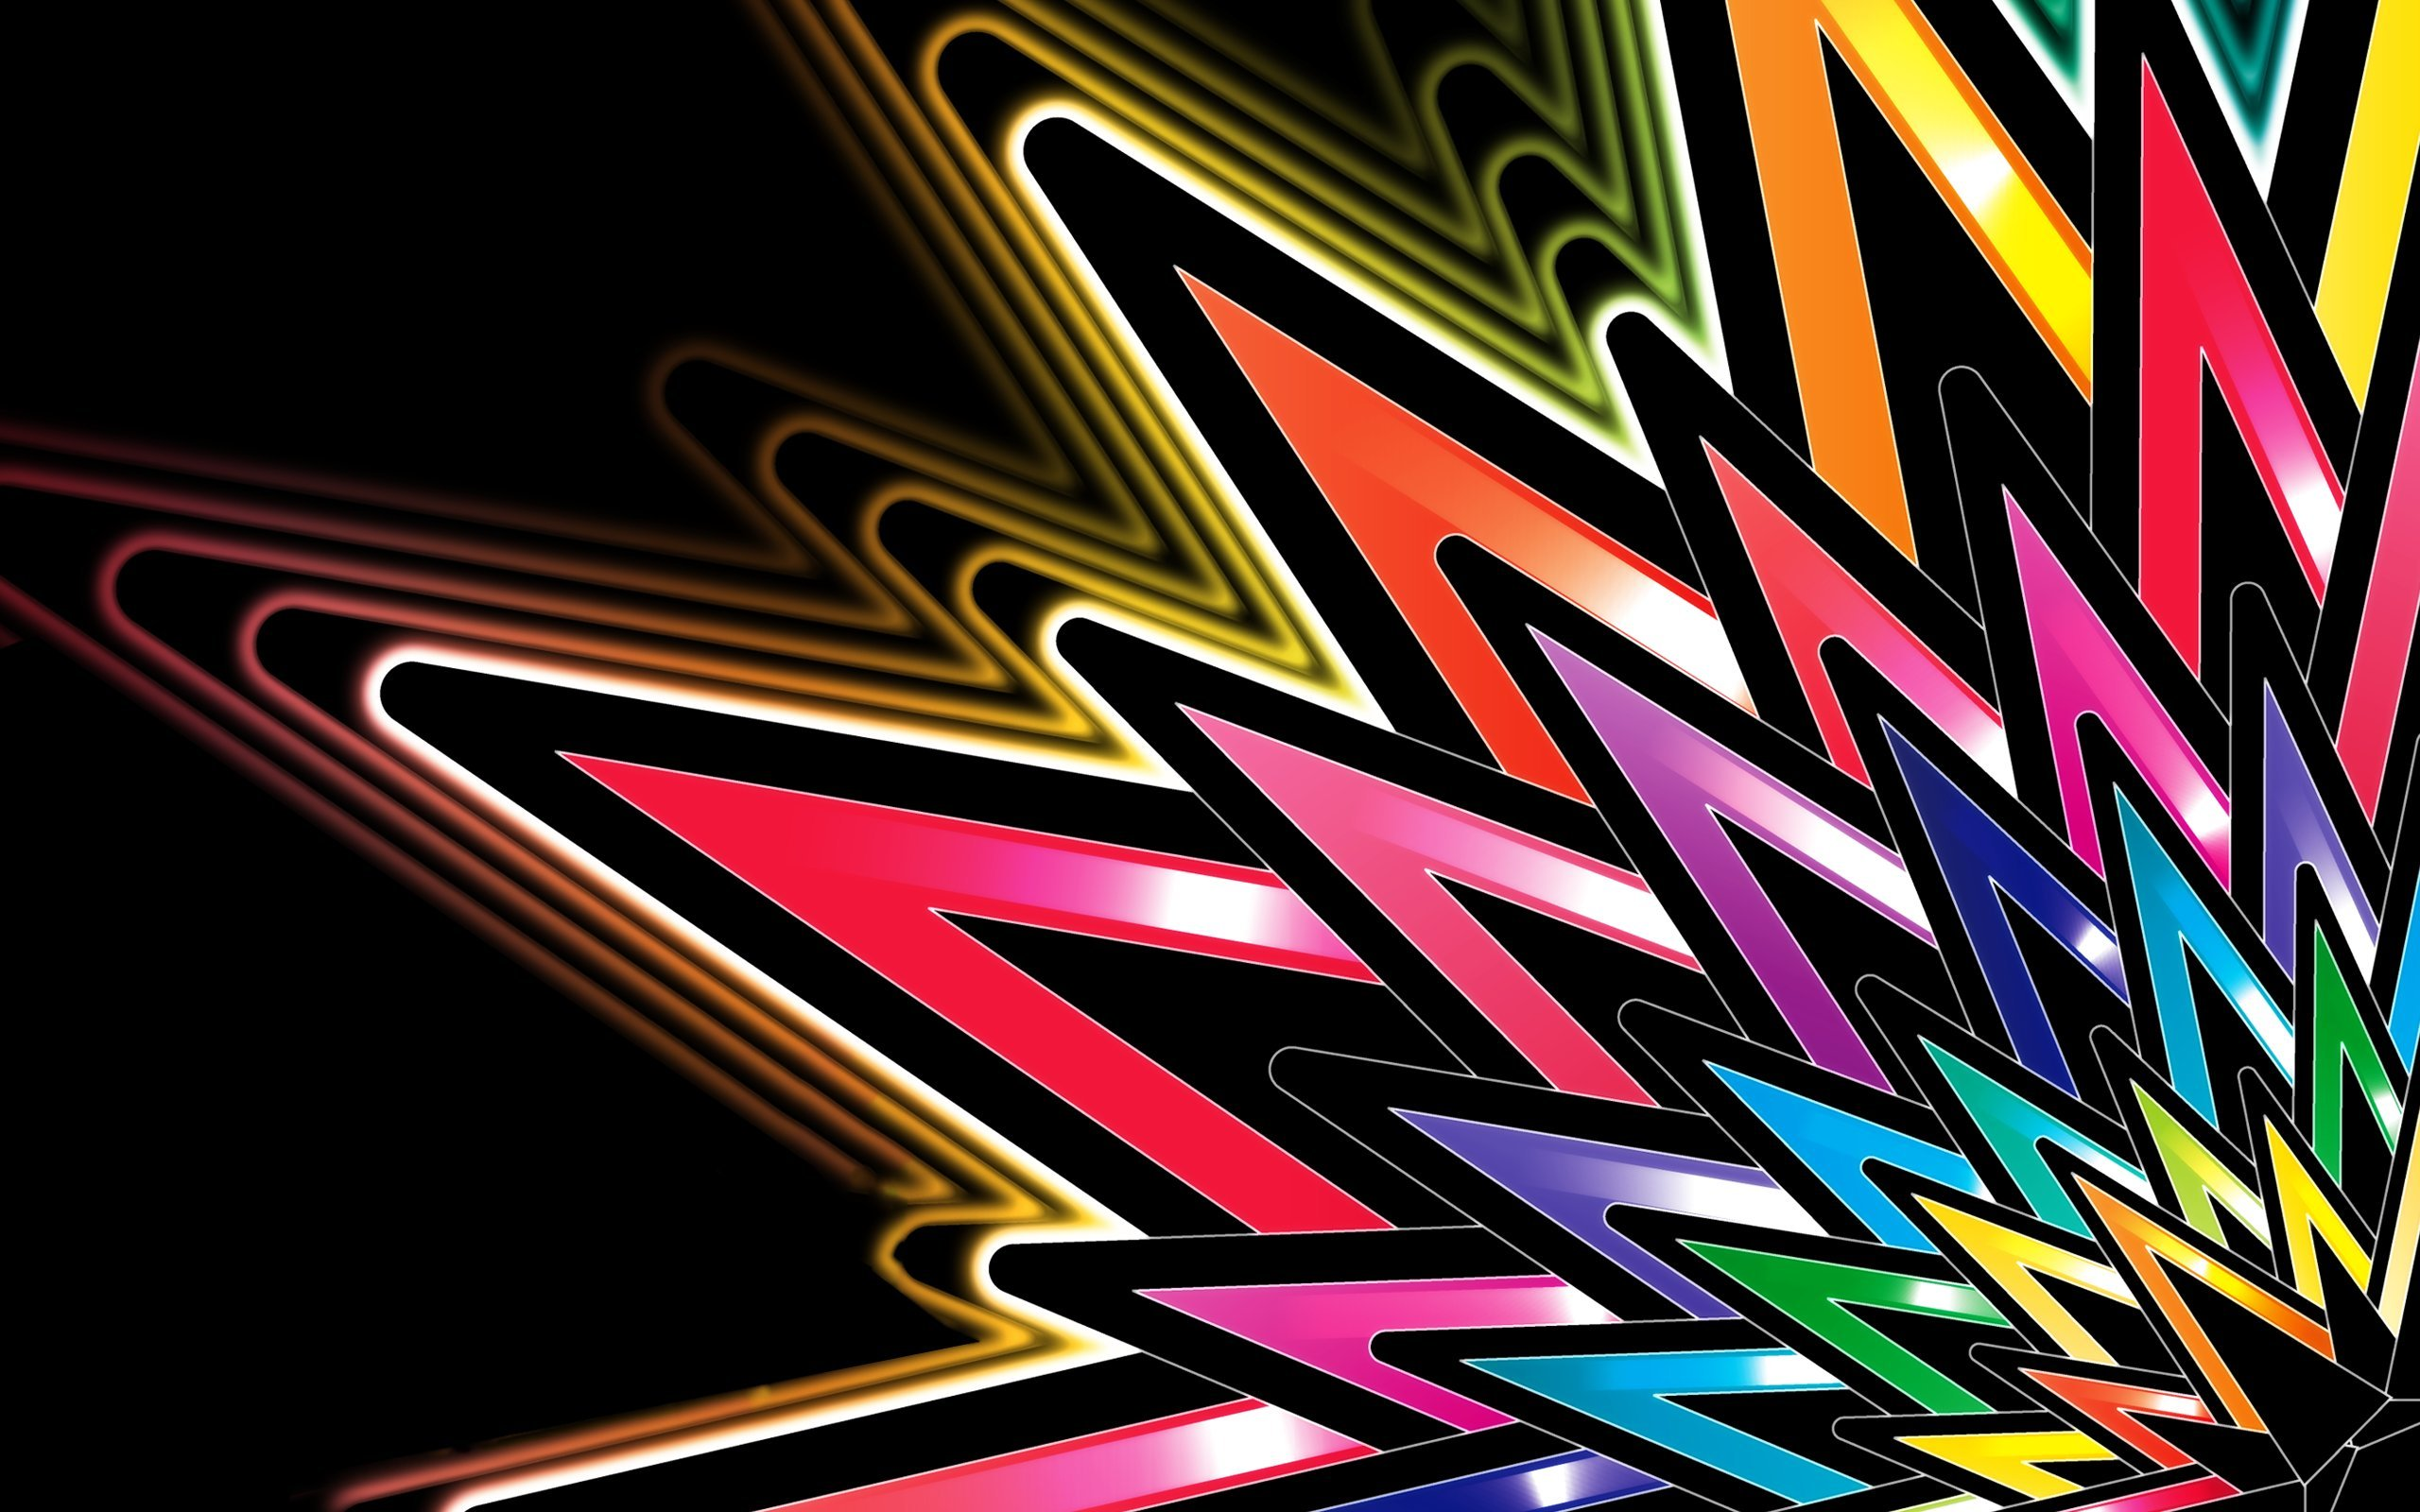 Colorful Cool Designs 2560x1600 Wallpaper Teahub Io